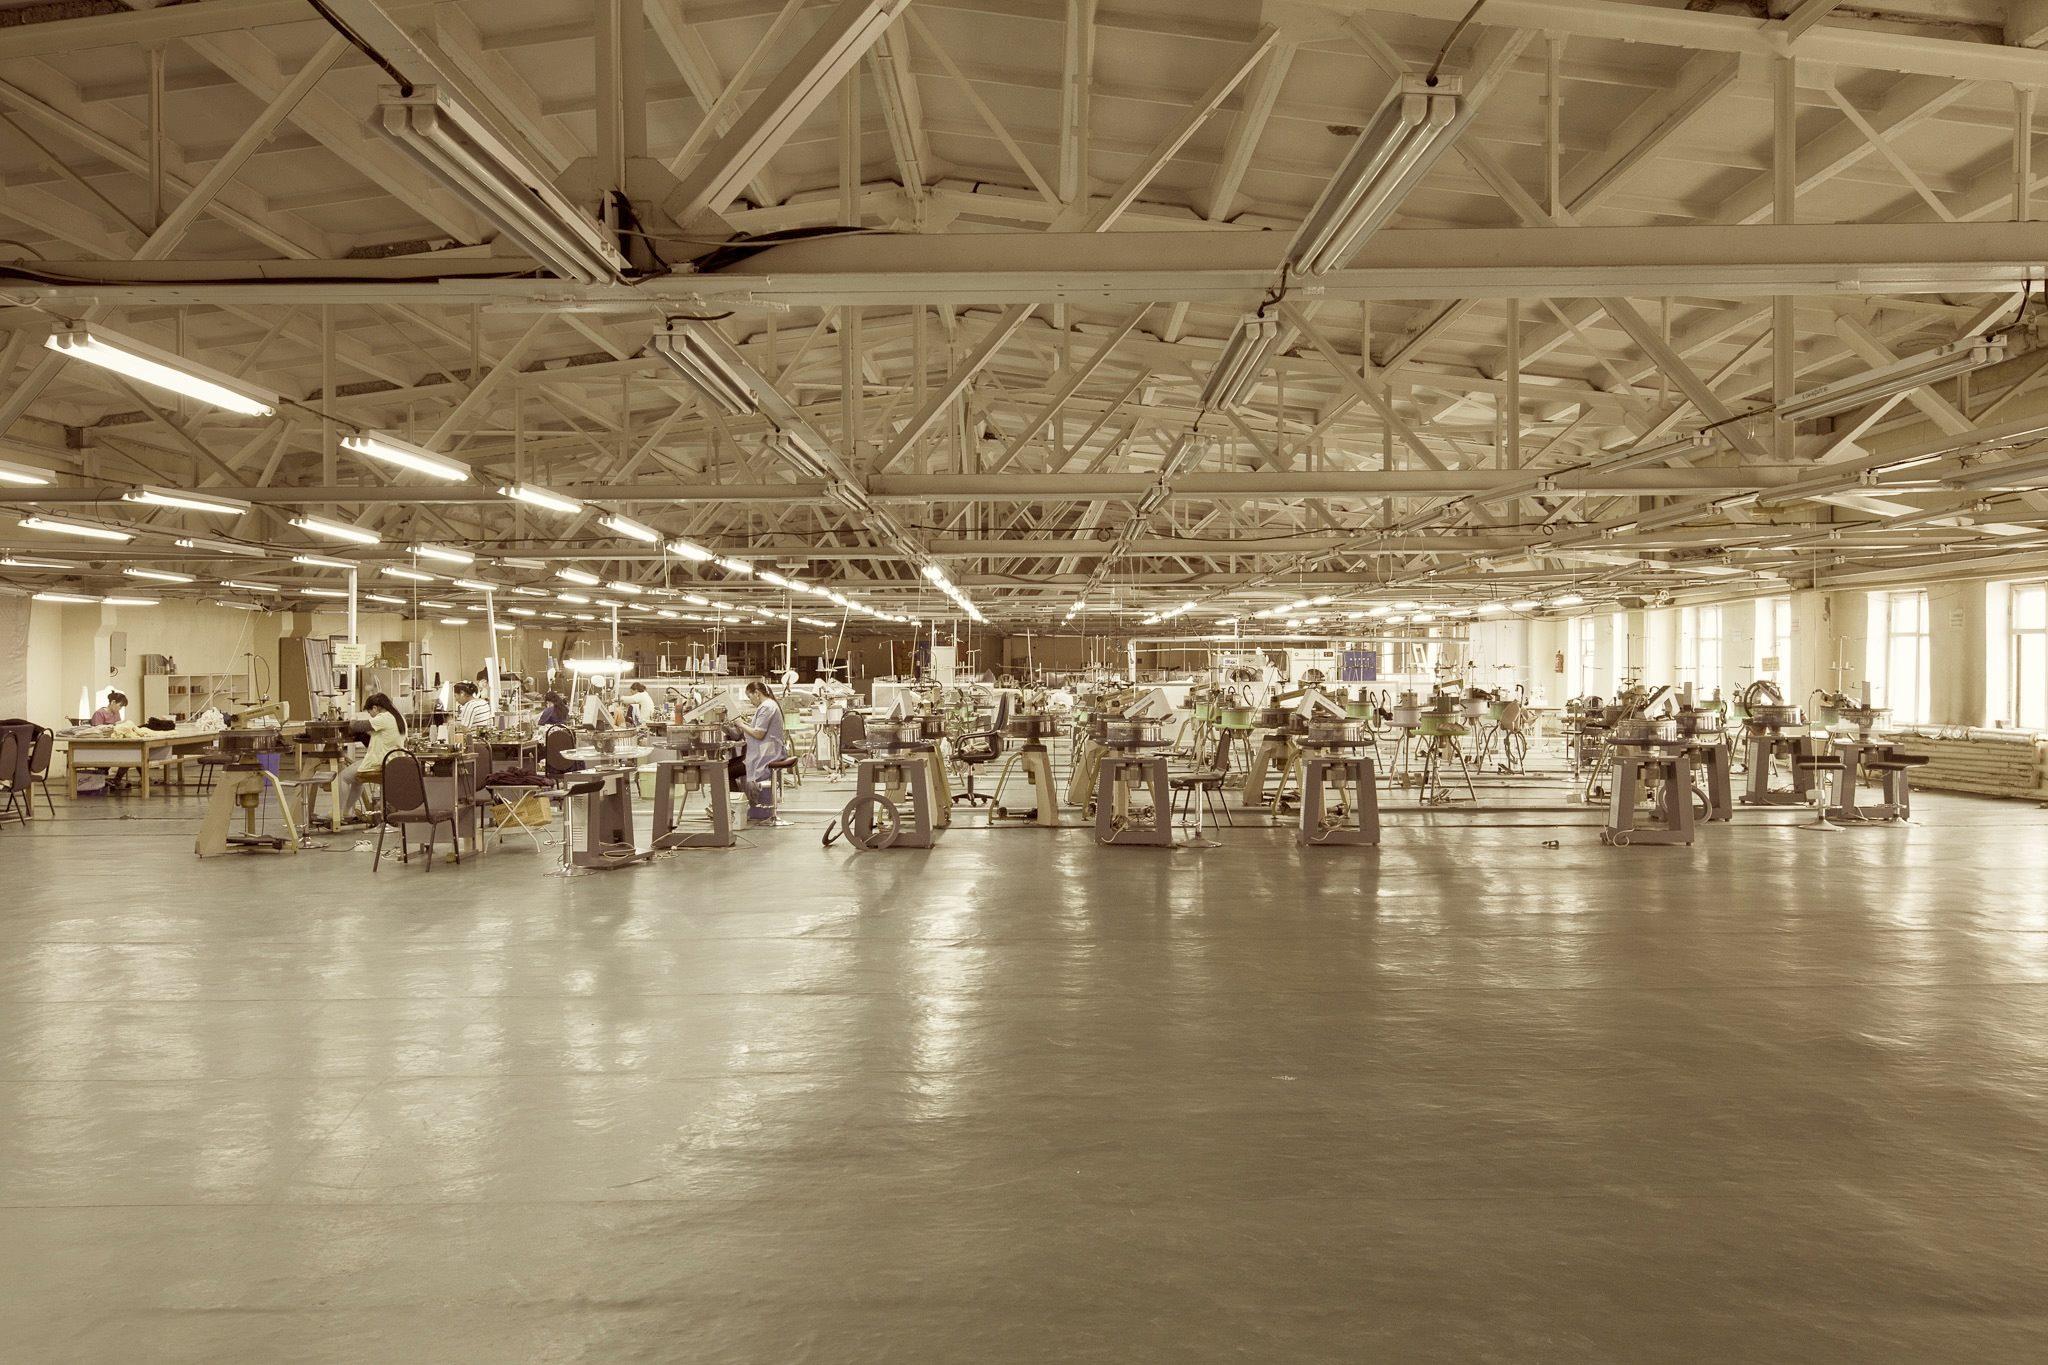 This is the factory in Ulaanbaatar, Mongolia. It is next door to Loro Piana's factory in Ulaanbaatar.